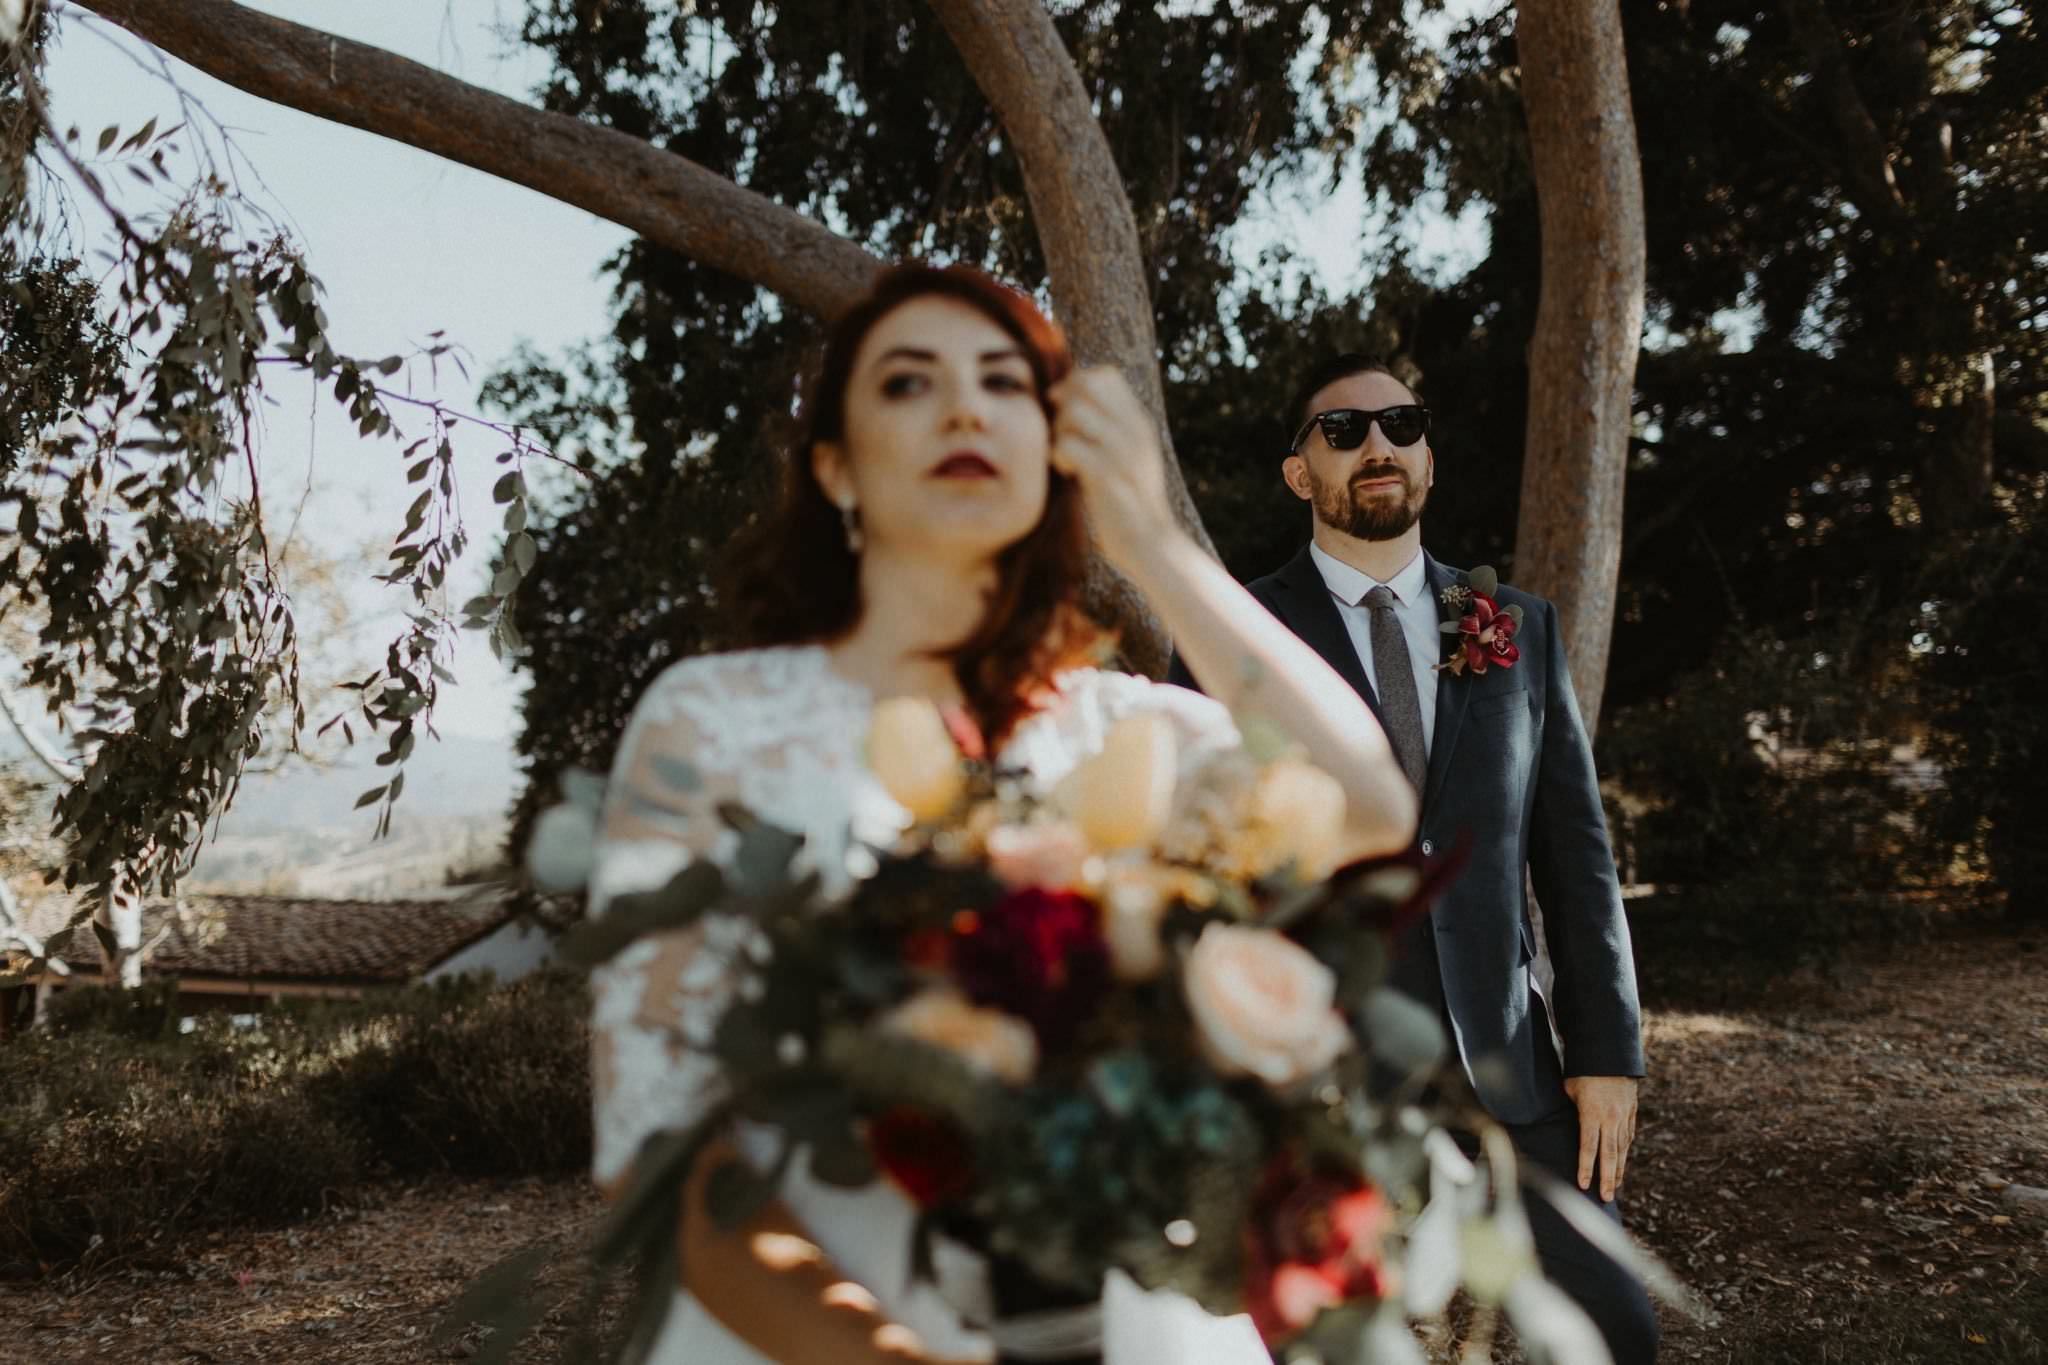 simi valley wedding photography 071